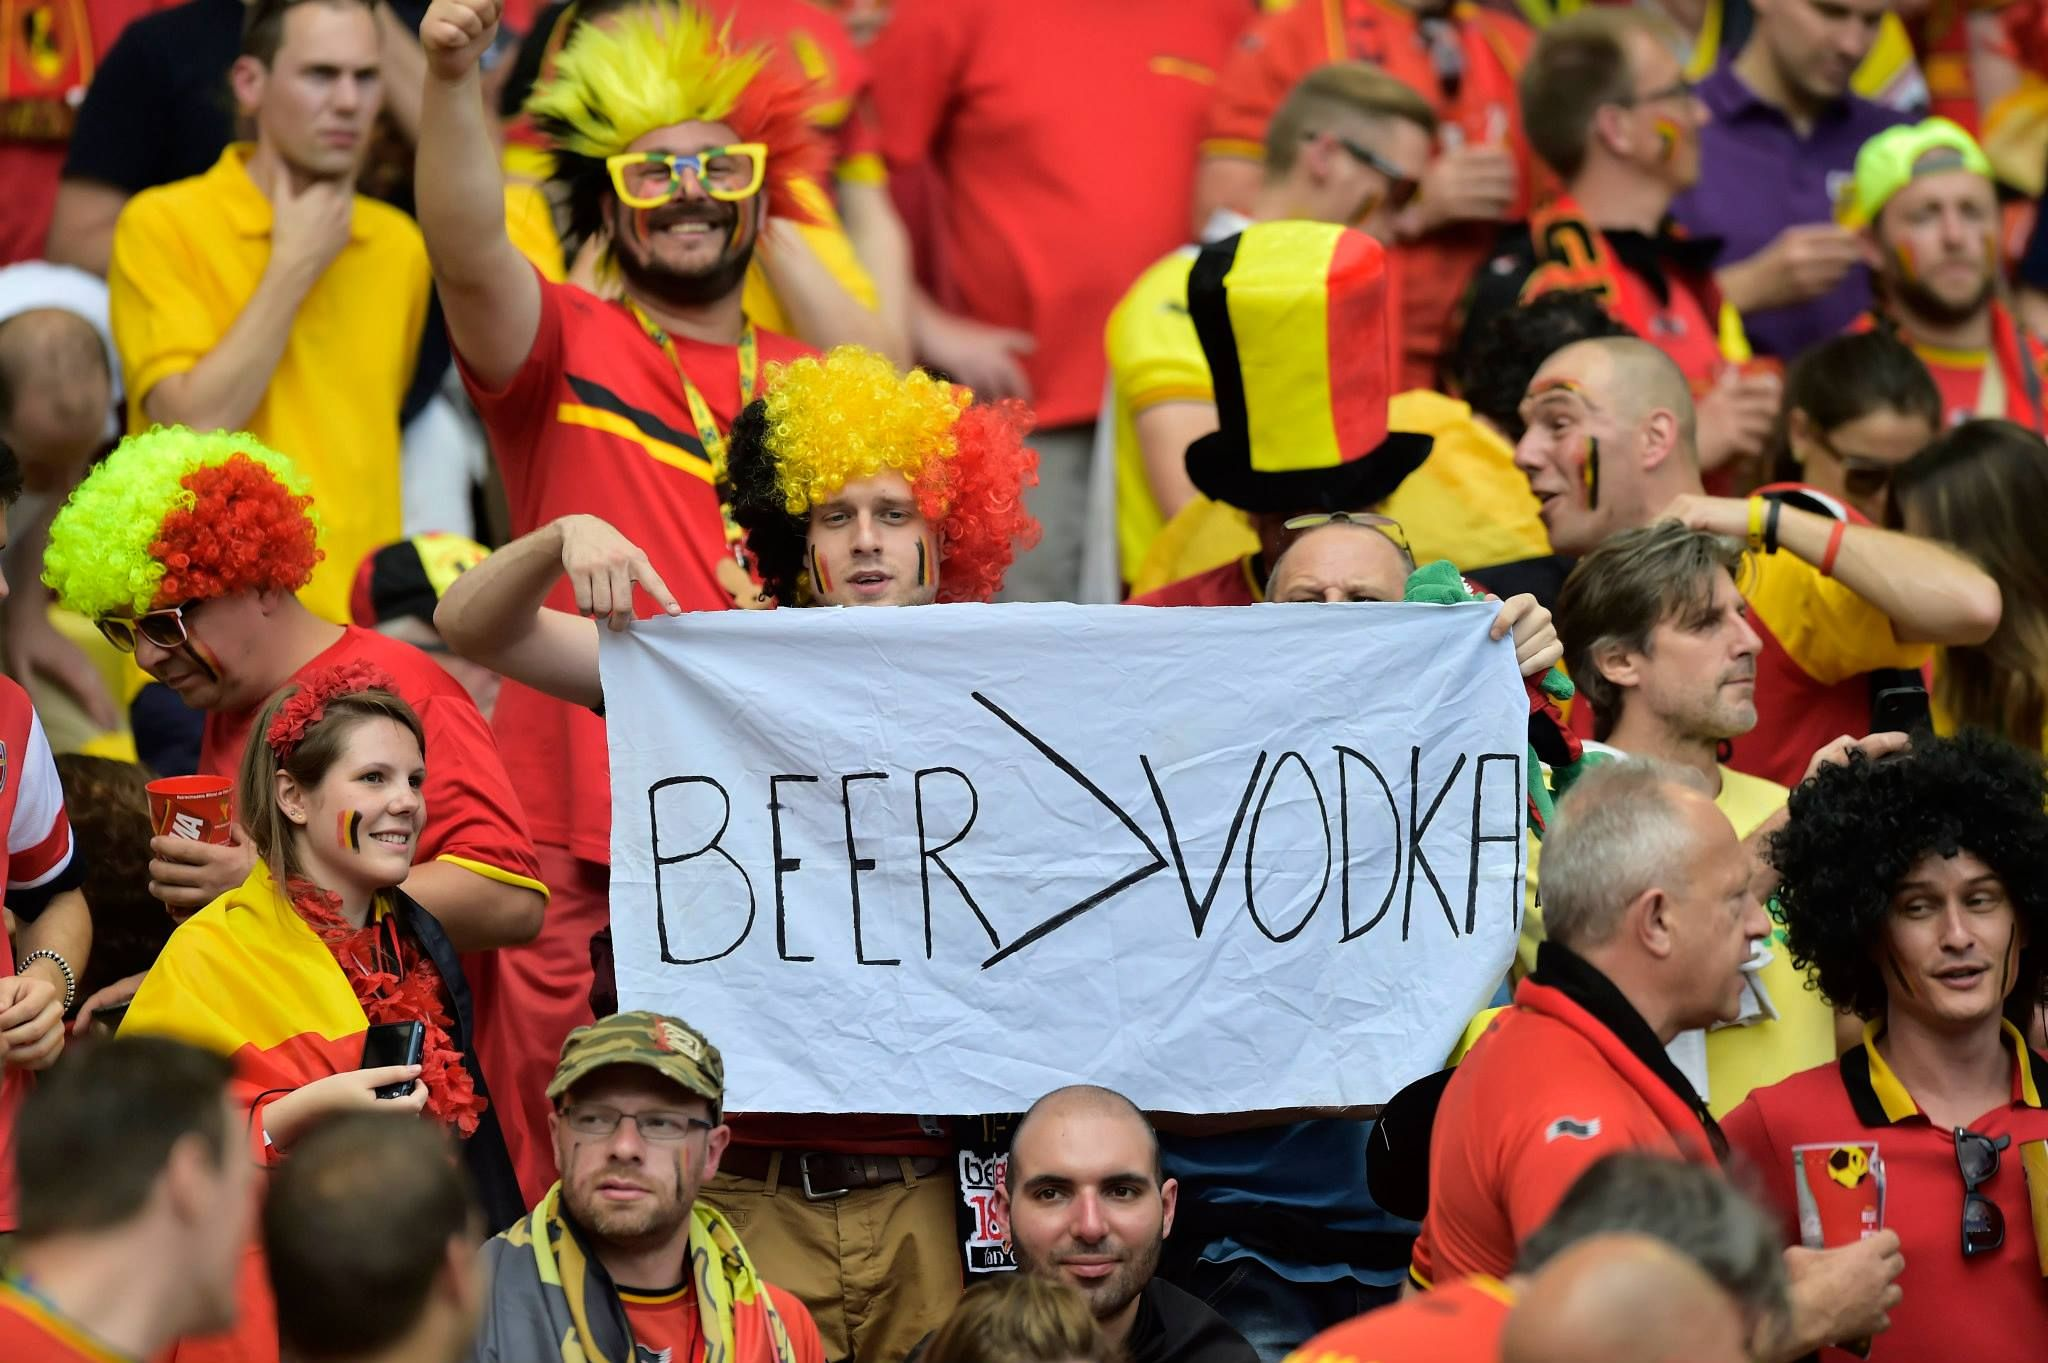 Beer Stronger Than Vodka #Worldcup